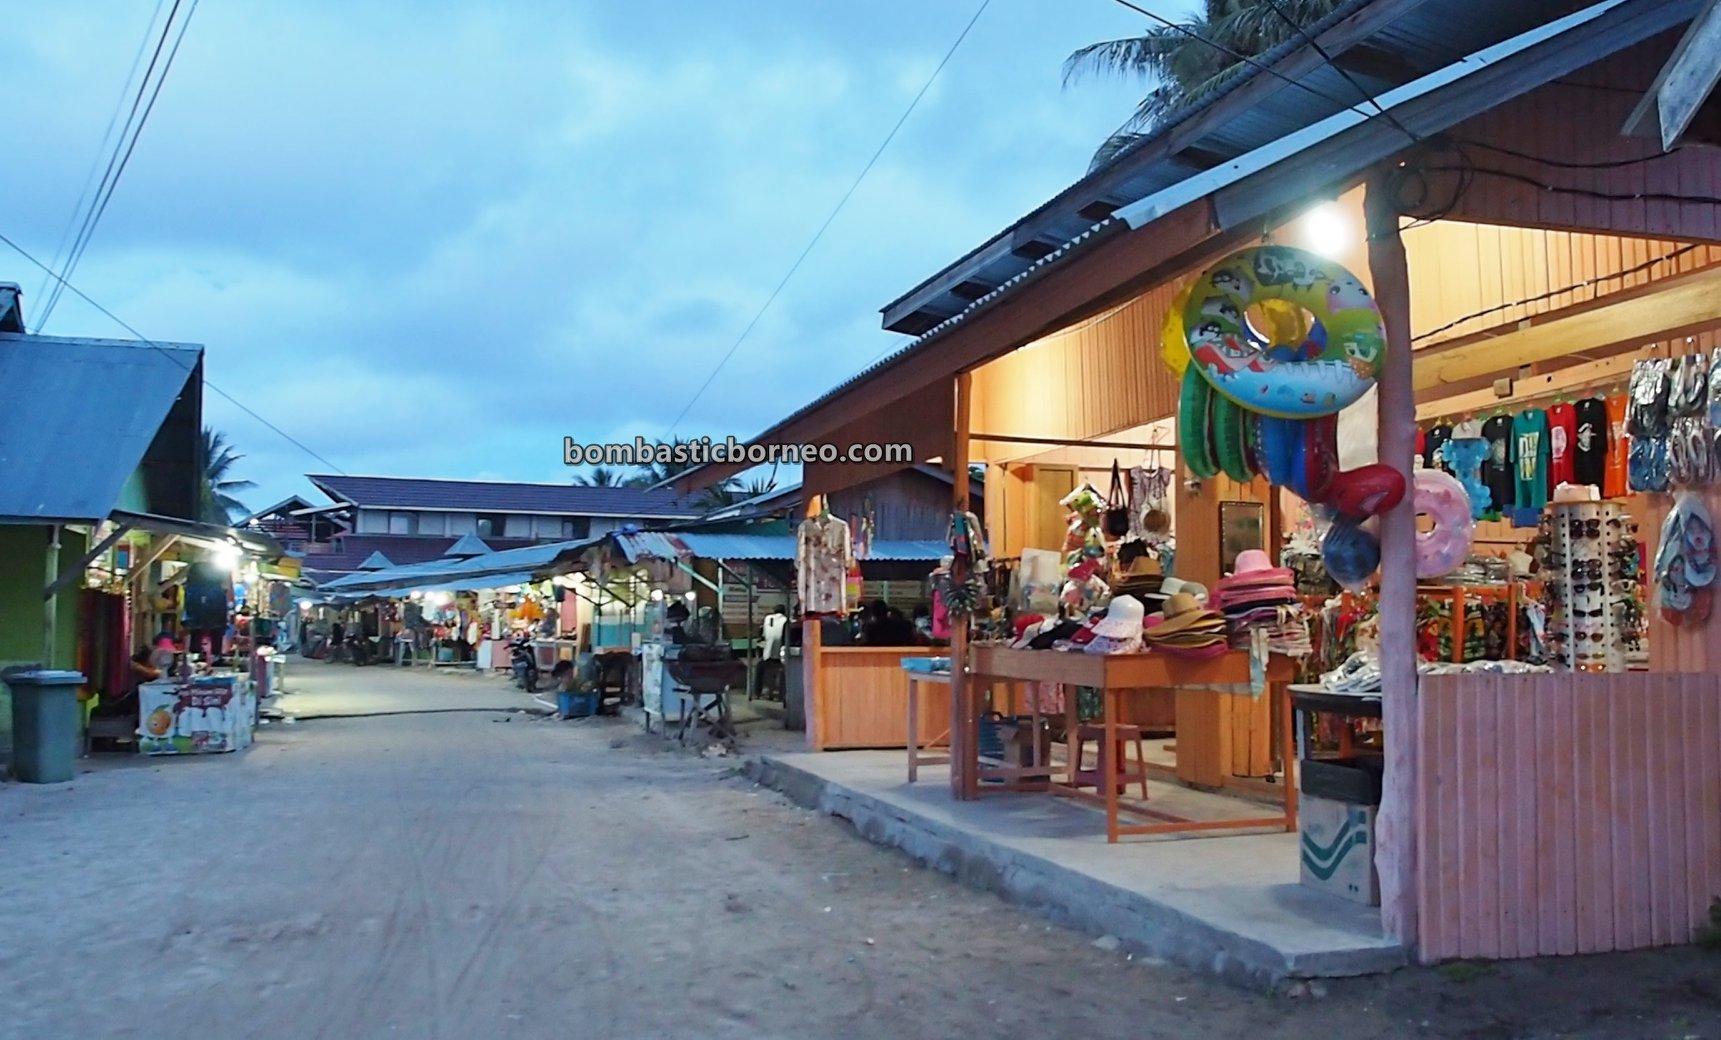 Familiarisation trip, nature, backpackers, destination, exploration, hidden paradise, Indonesia, Bajau village, Berau, Derawan Island, East kalimantan, Tourism, tourist attraction, travel guide, Borneo,